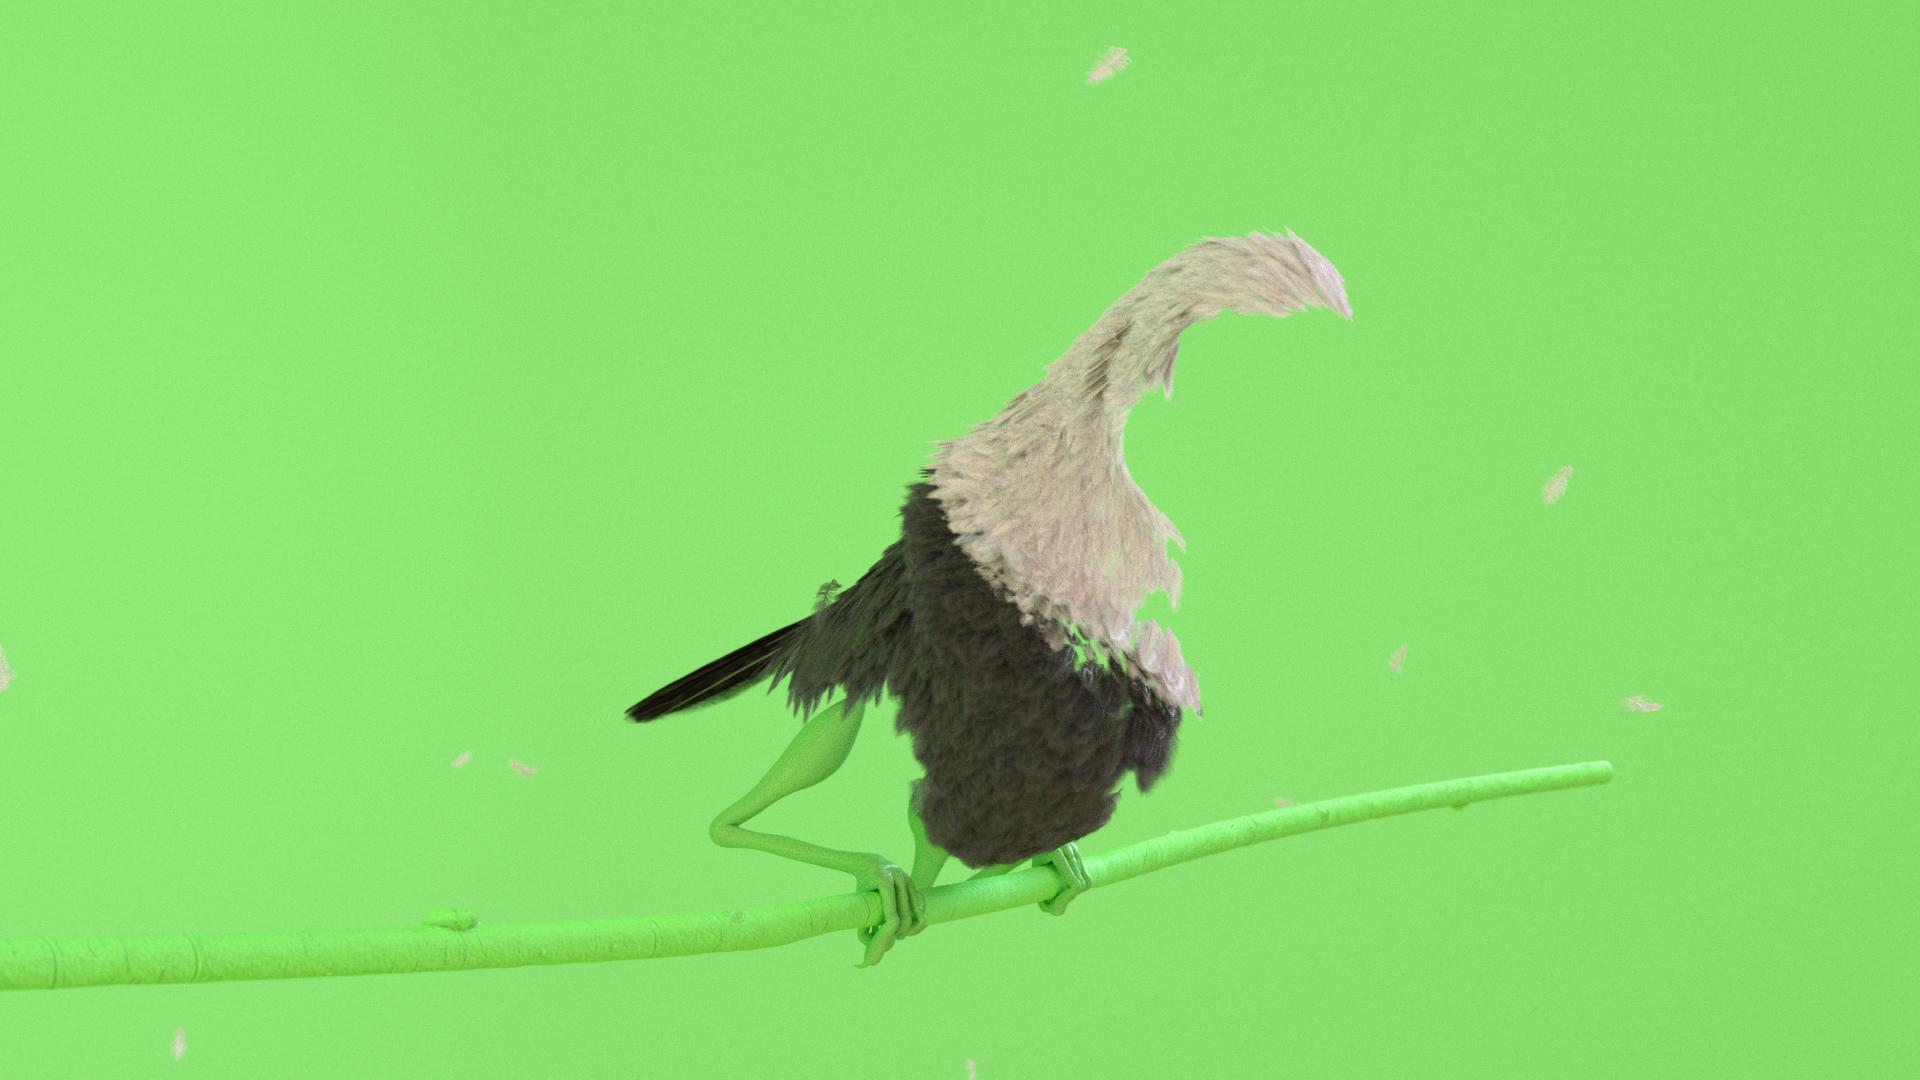 Birds_Feathers.jpg